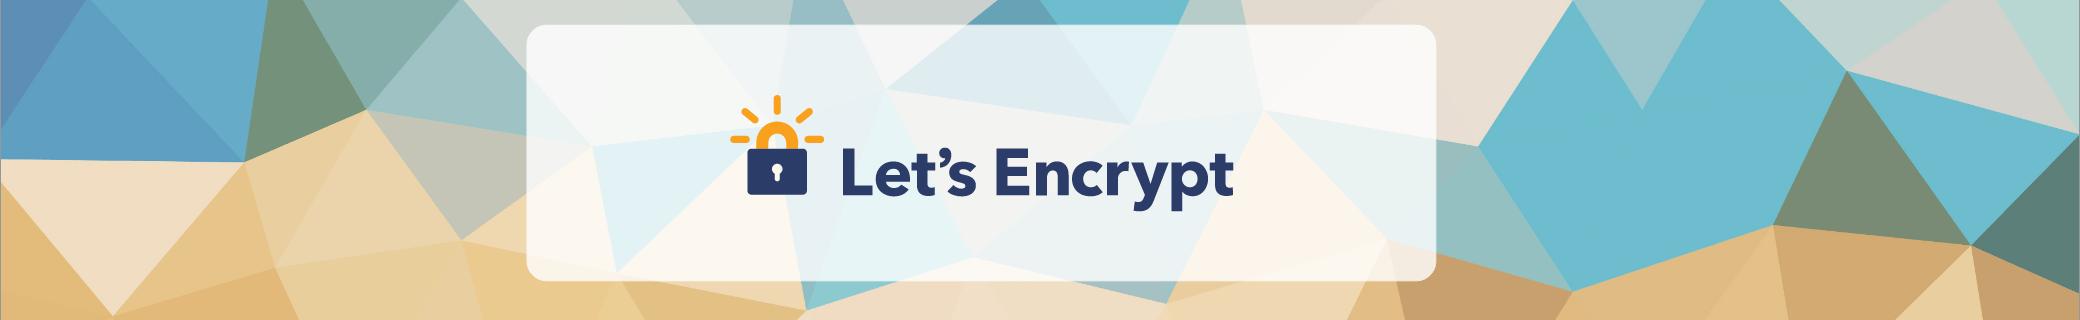 Let's Encrypt Free SSL